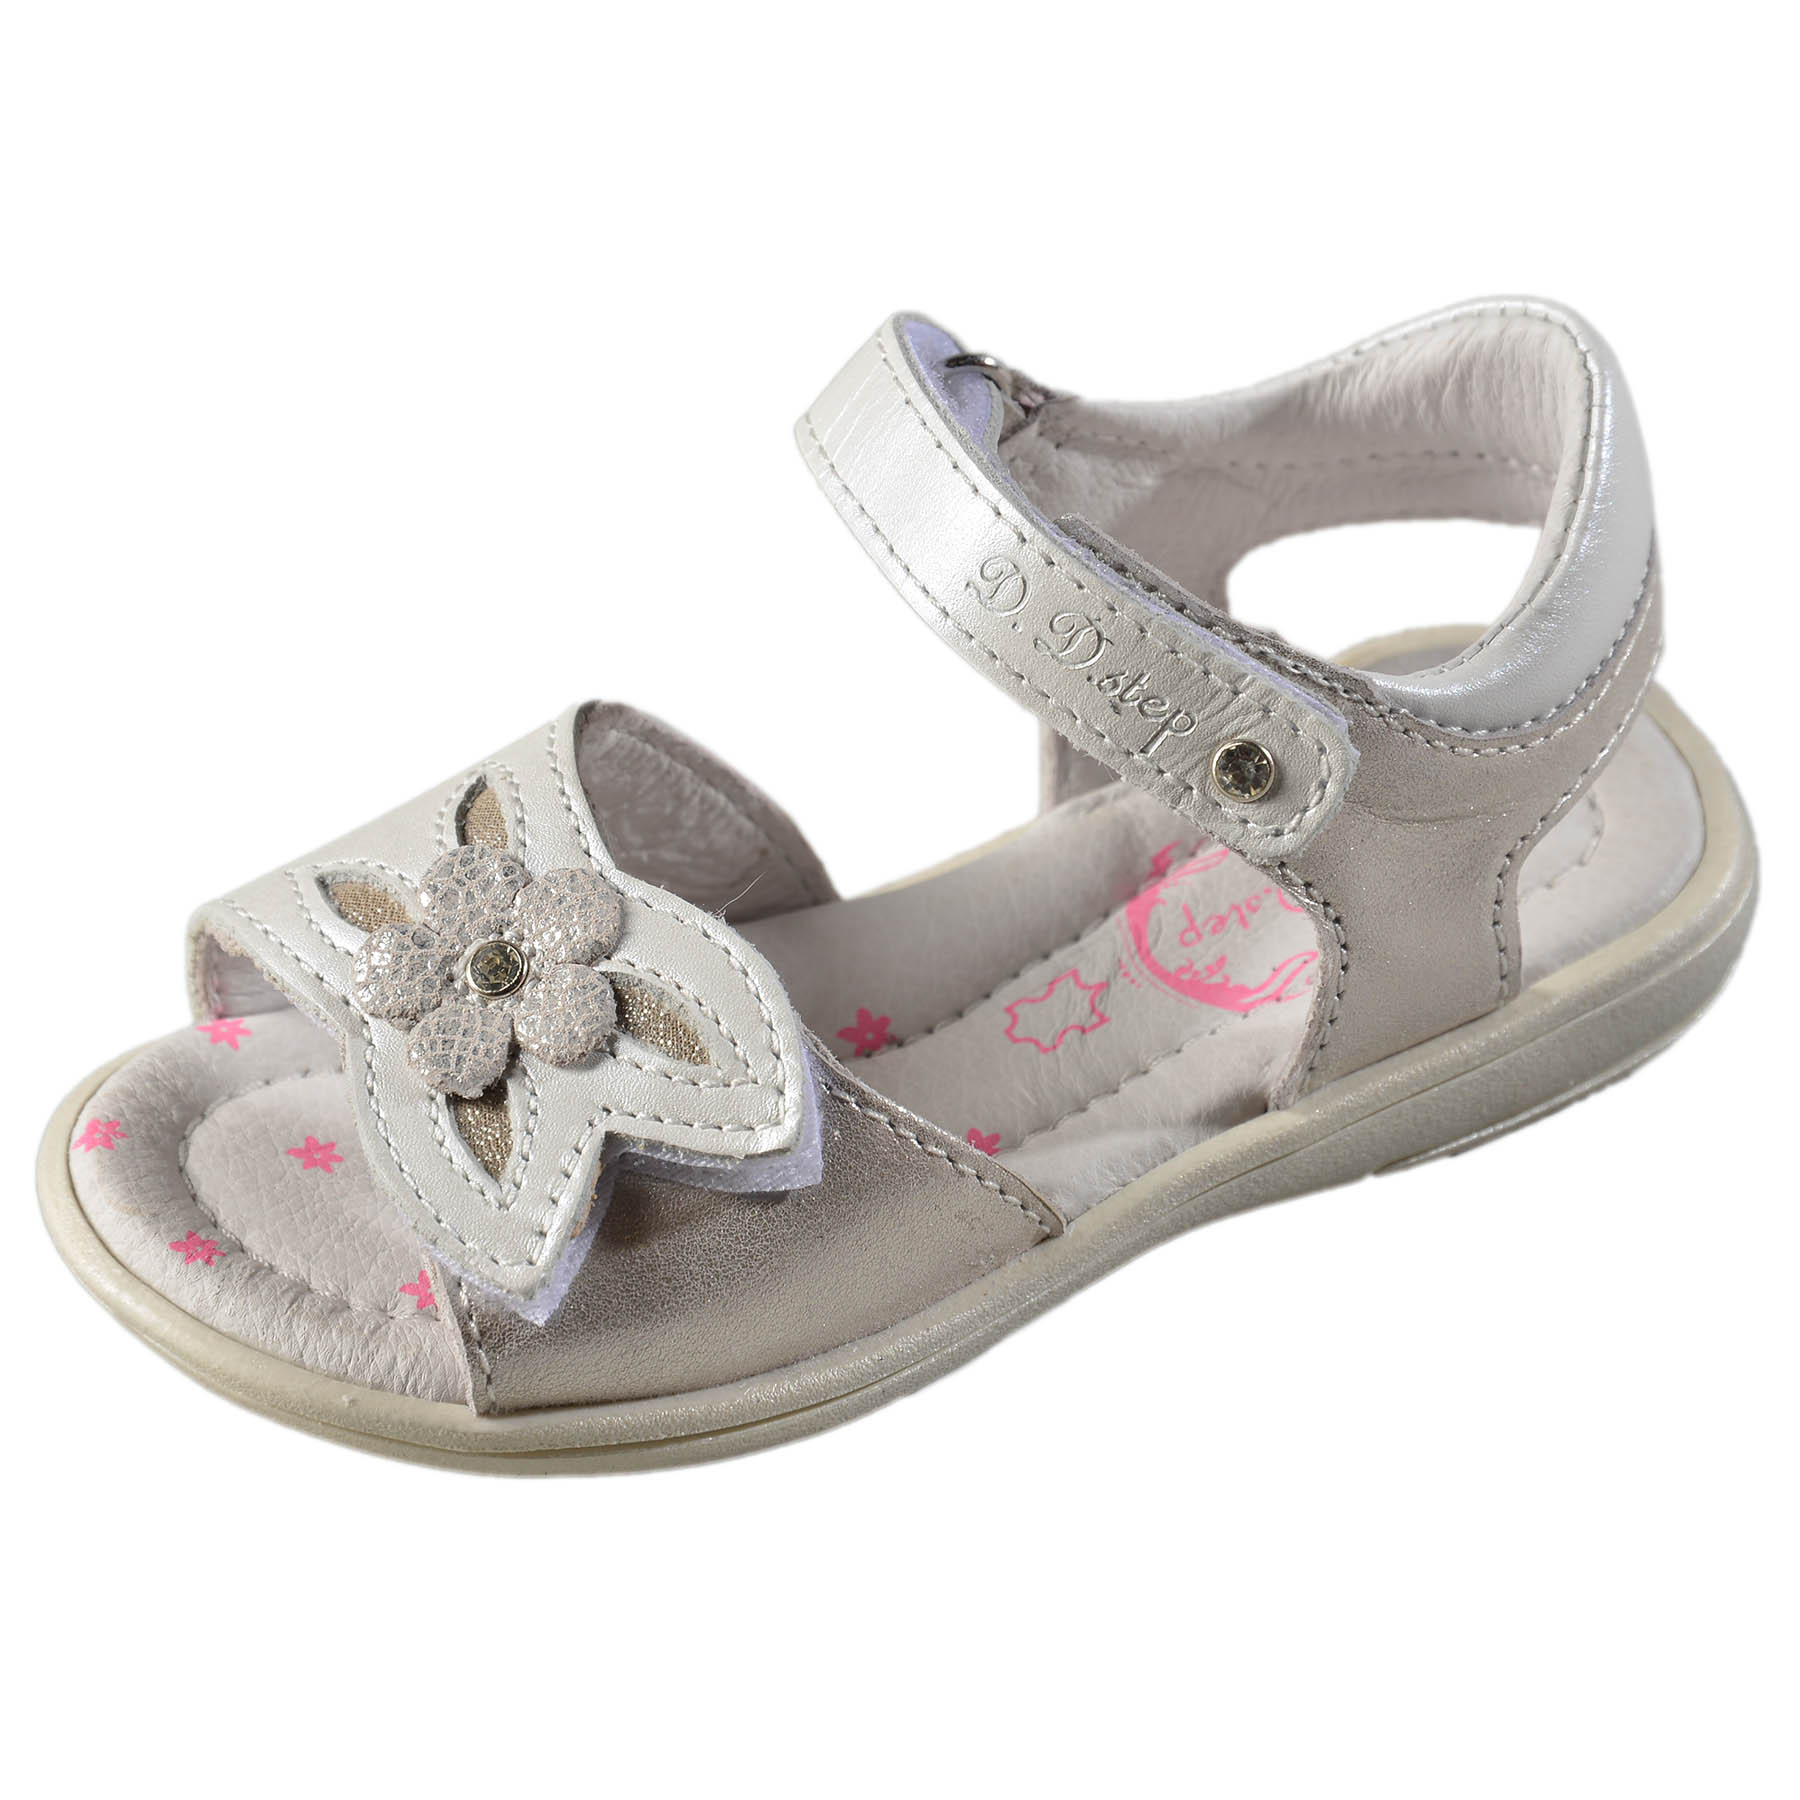 105c5bec96 Dievčenské kožené sandále-Silver DDstep - K03-3001L